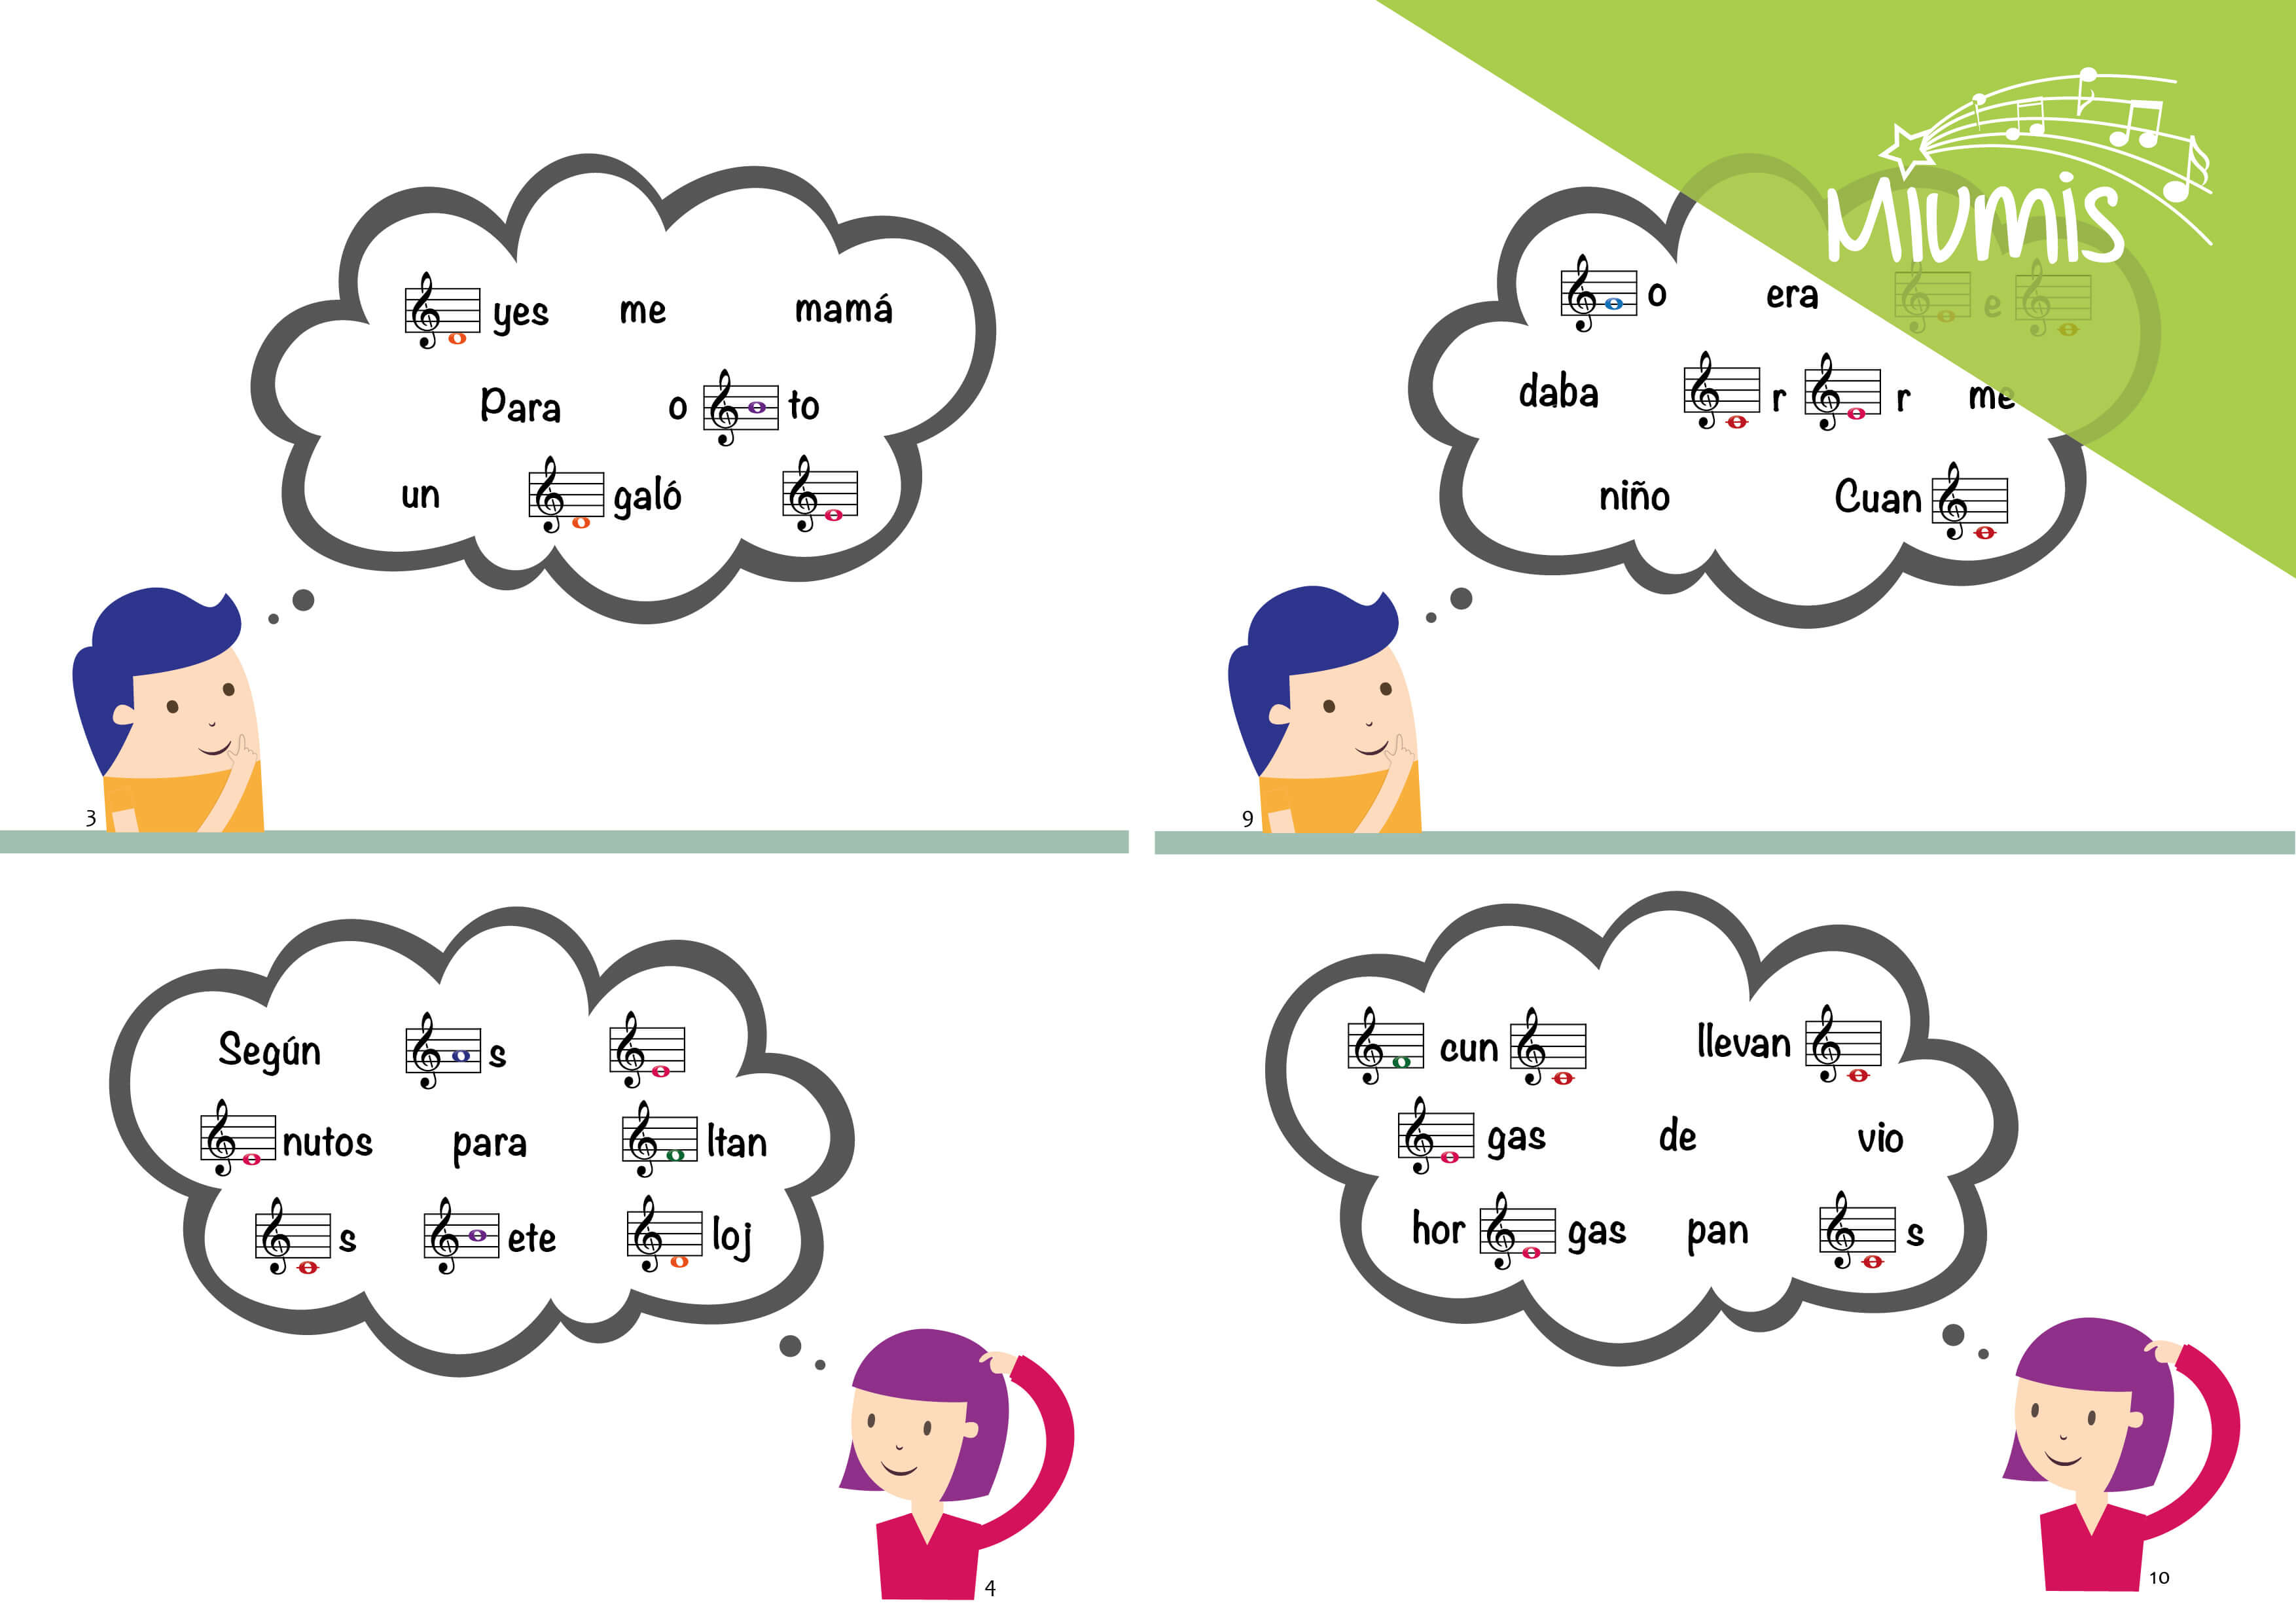 Frases en clave musical – Miumis